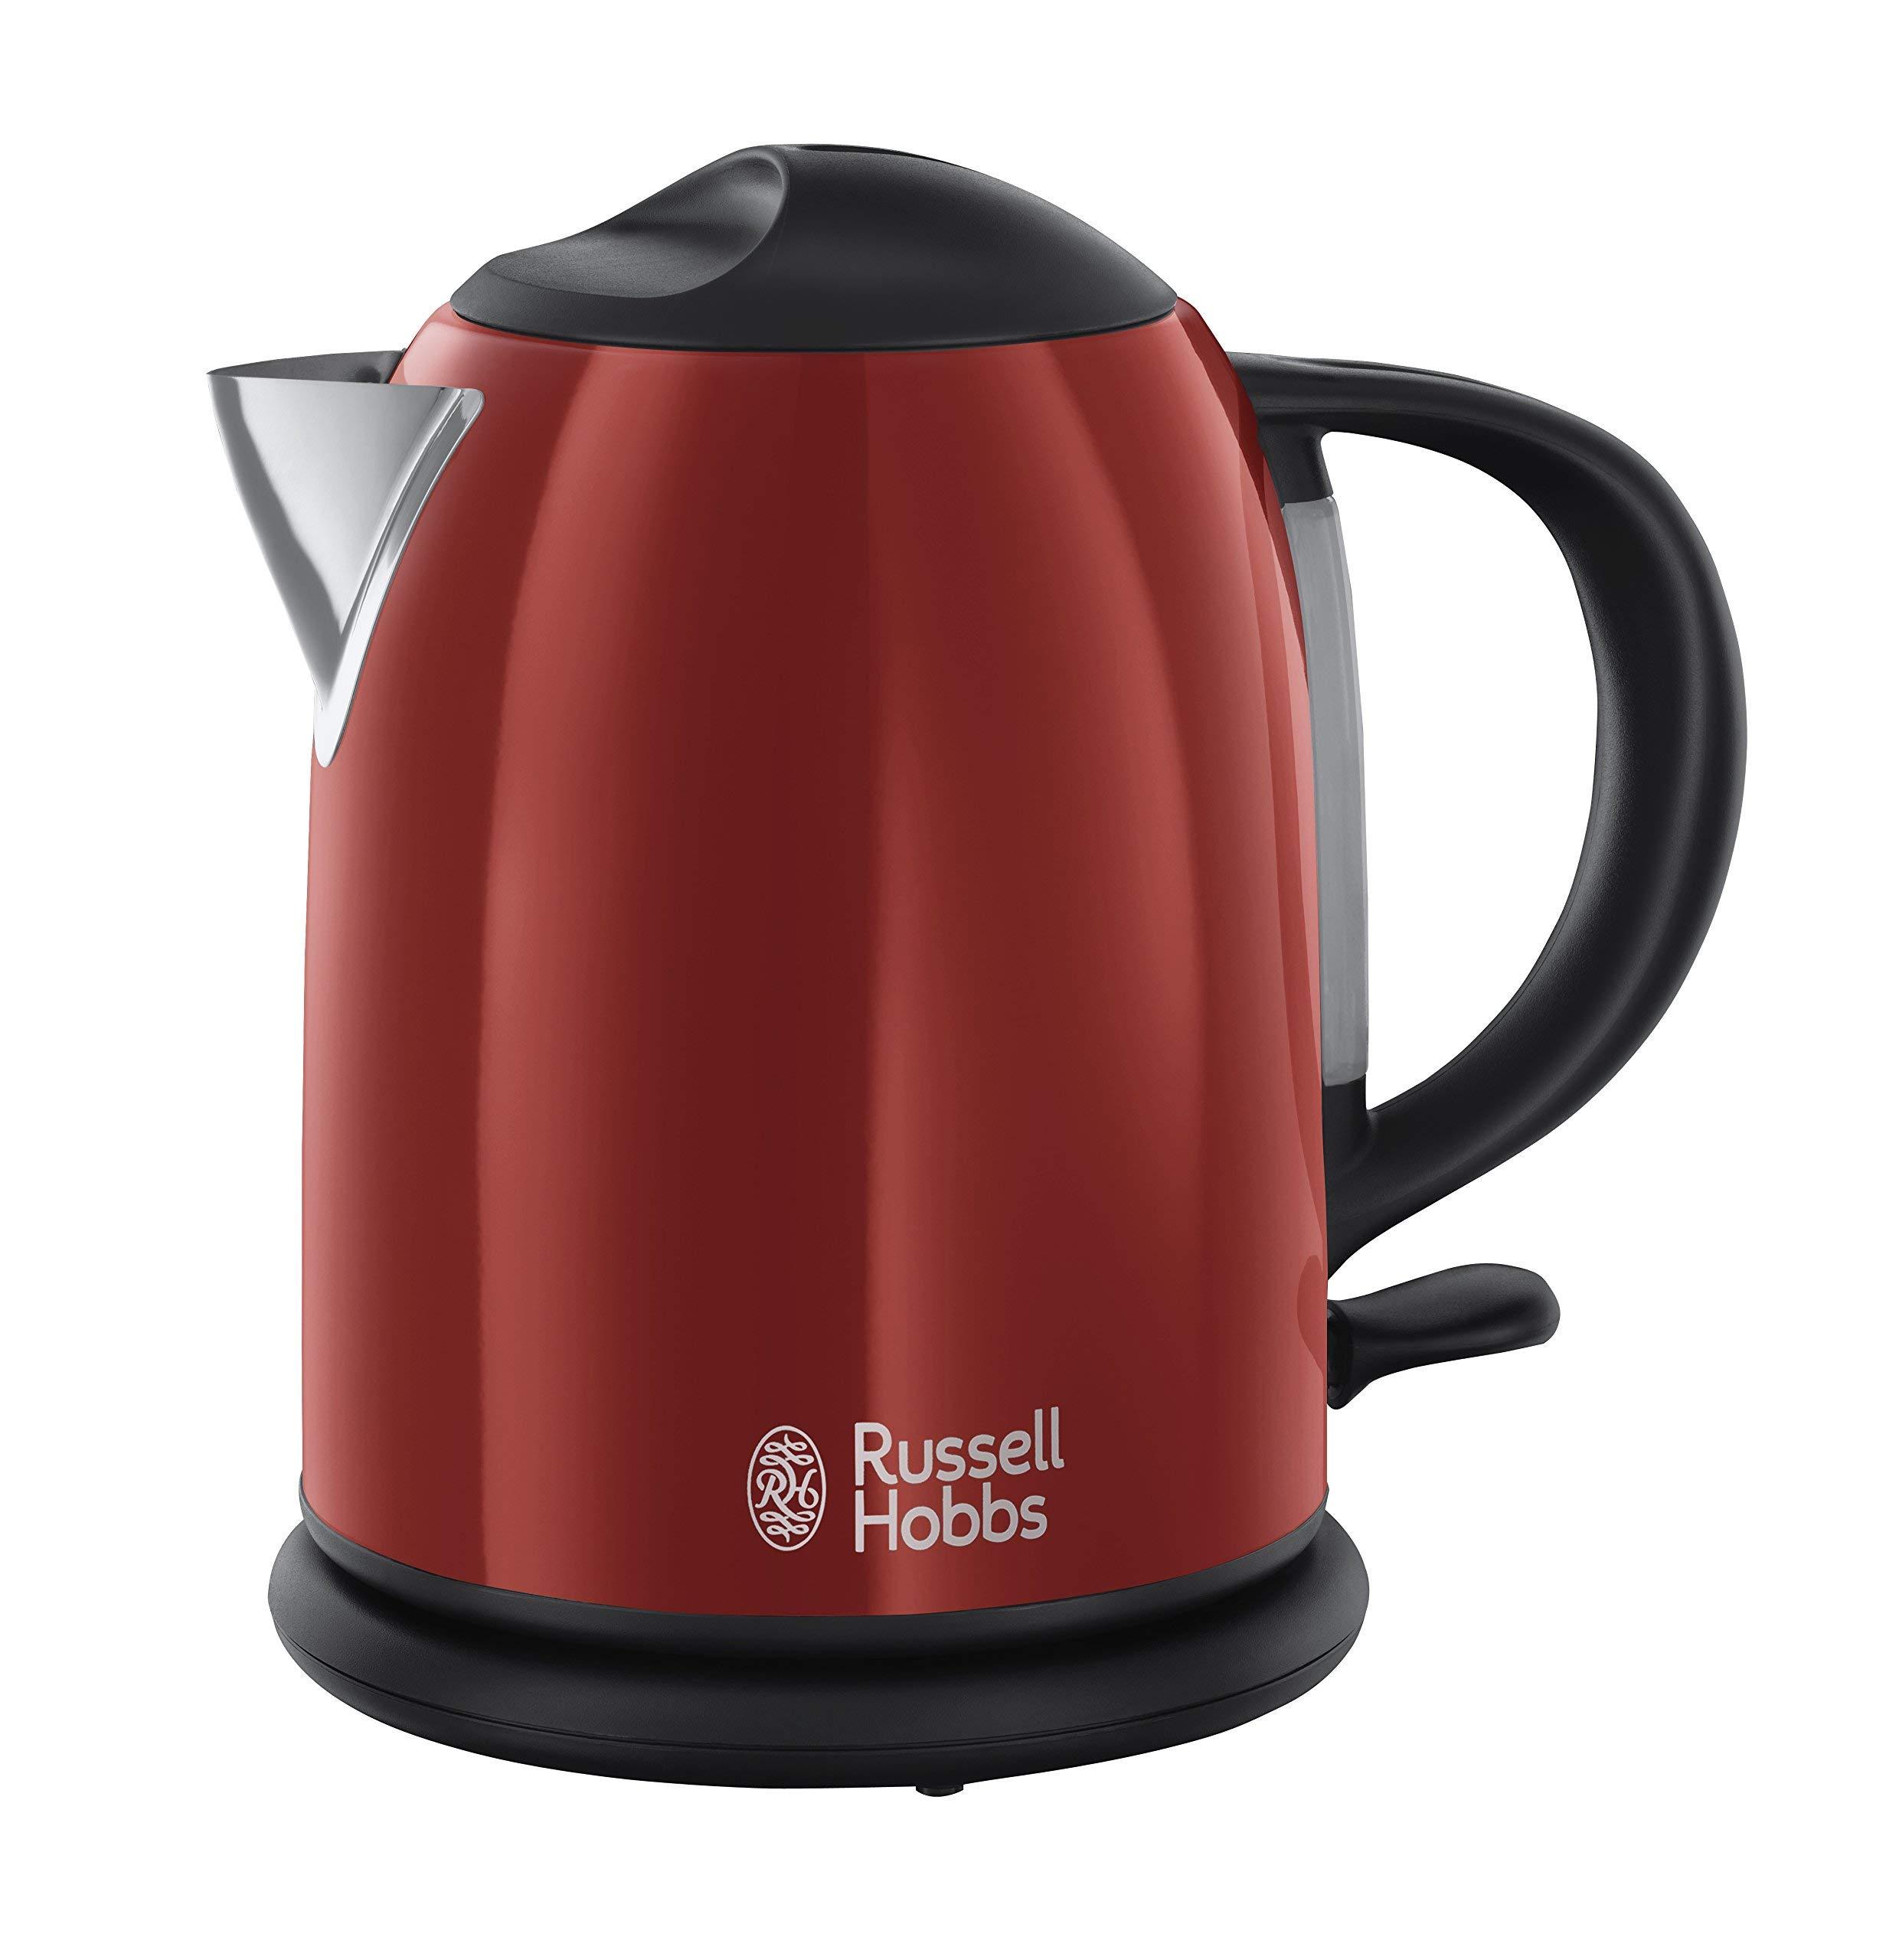 Russell Hobbs Colours Red - Hervidor de agua compacto, 1L, resistencia oculta, 2200 W, acero inoxidable, Rojo - ref. 20191-70 product image